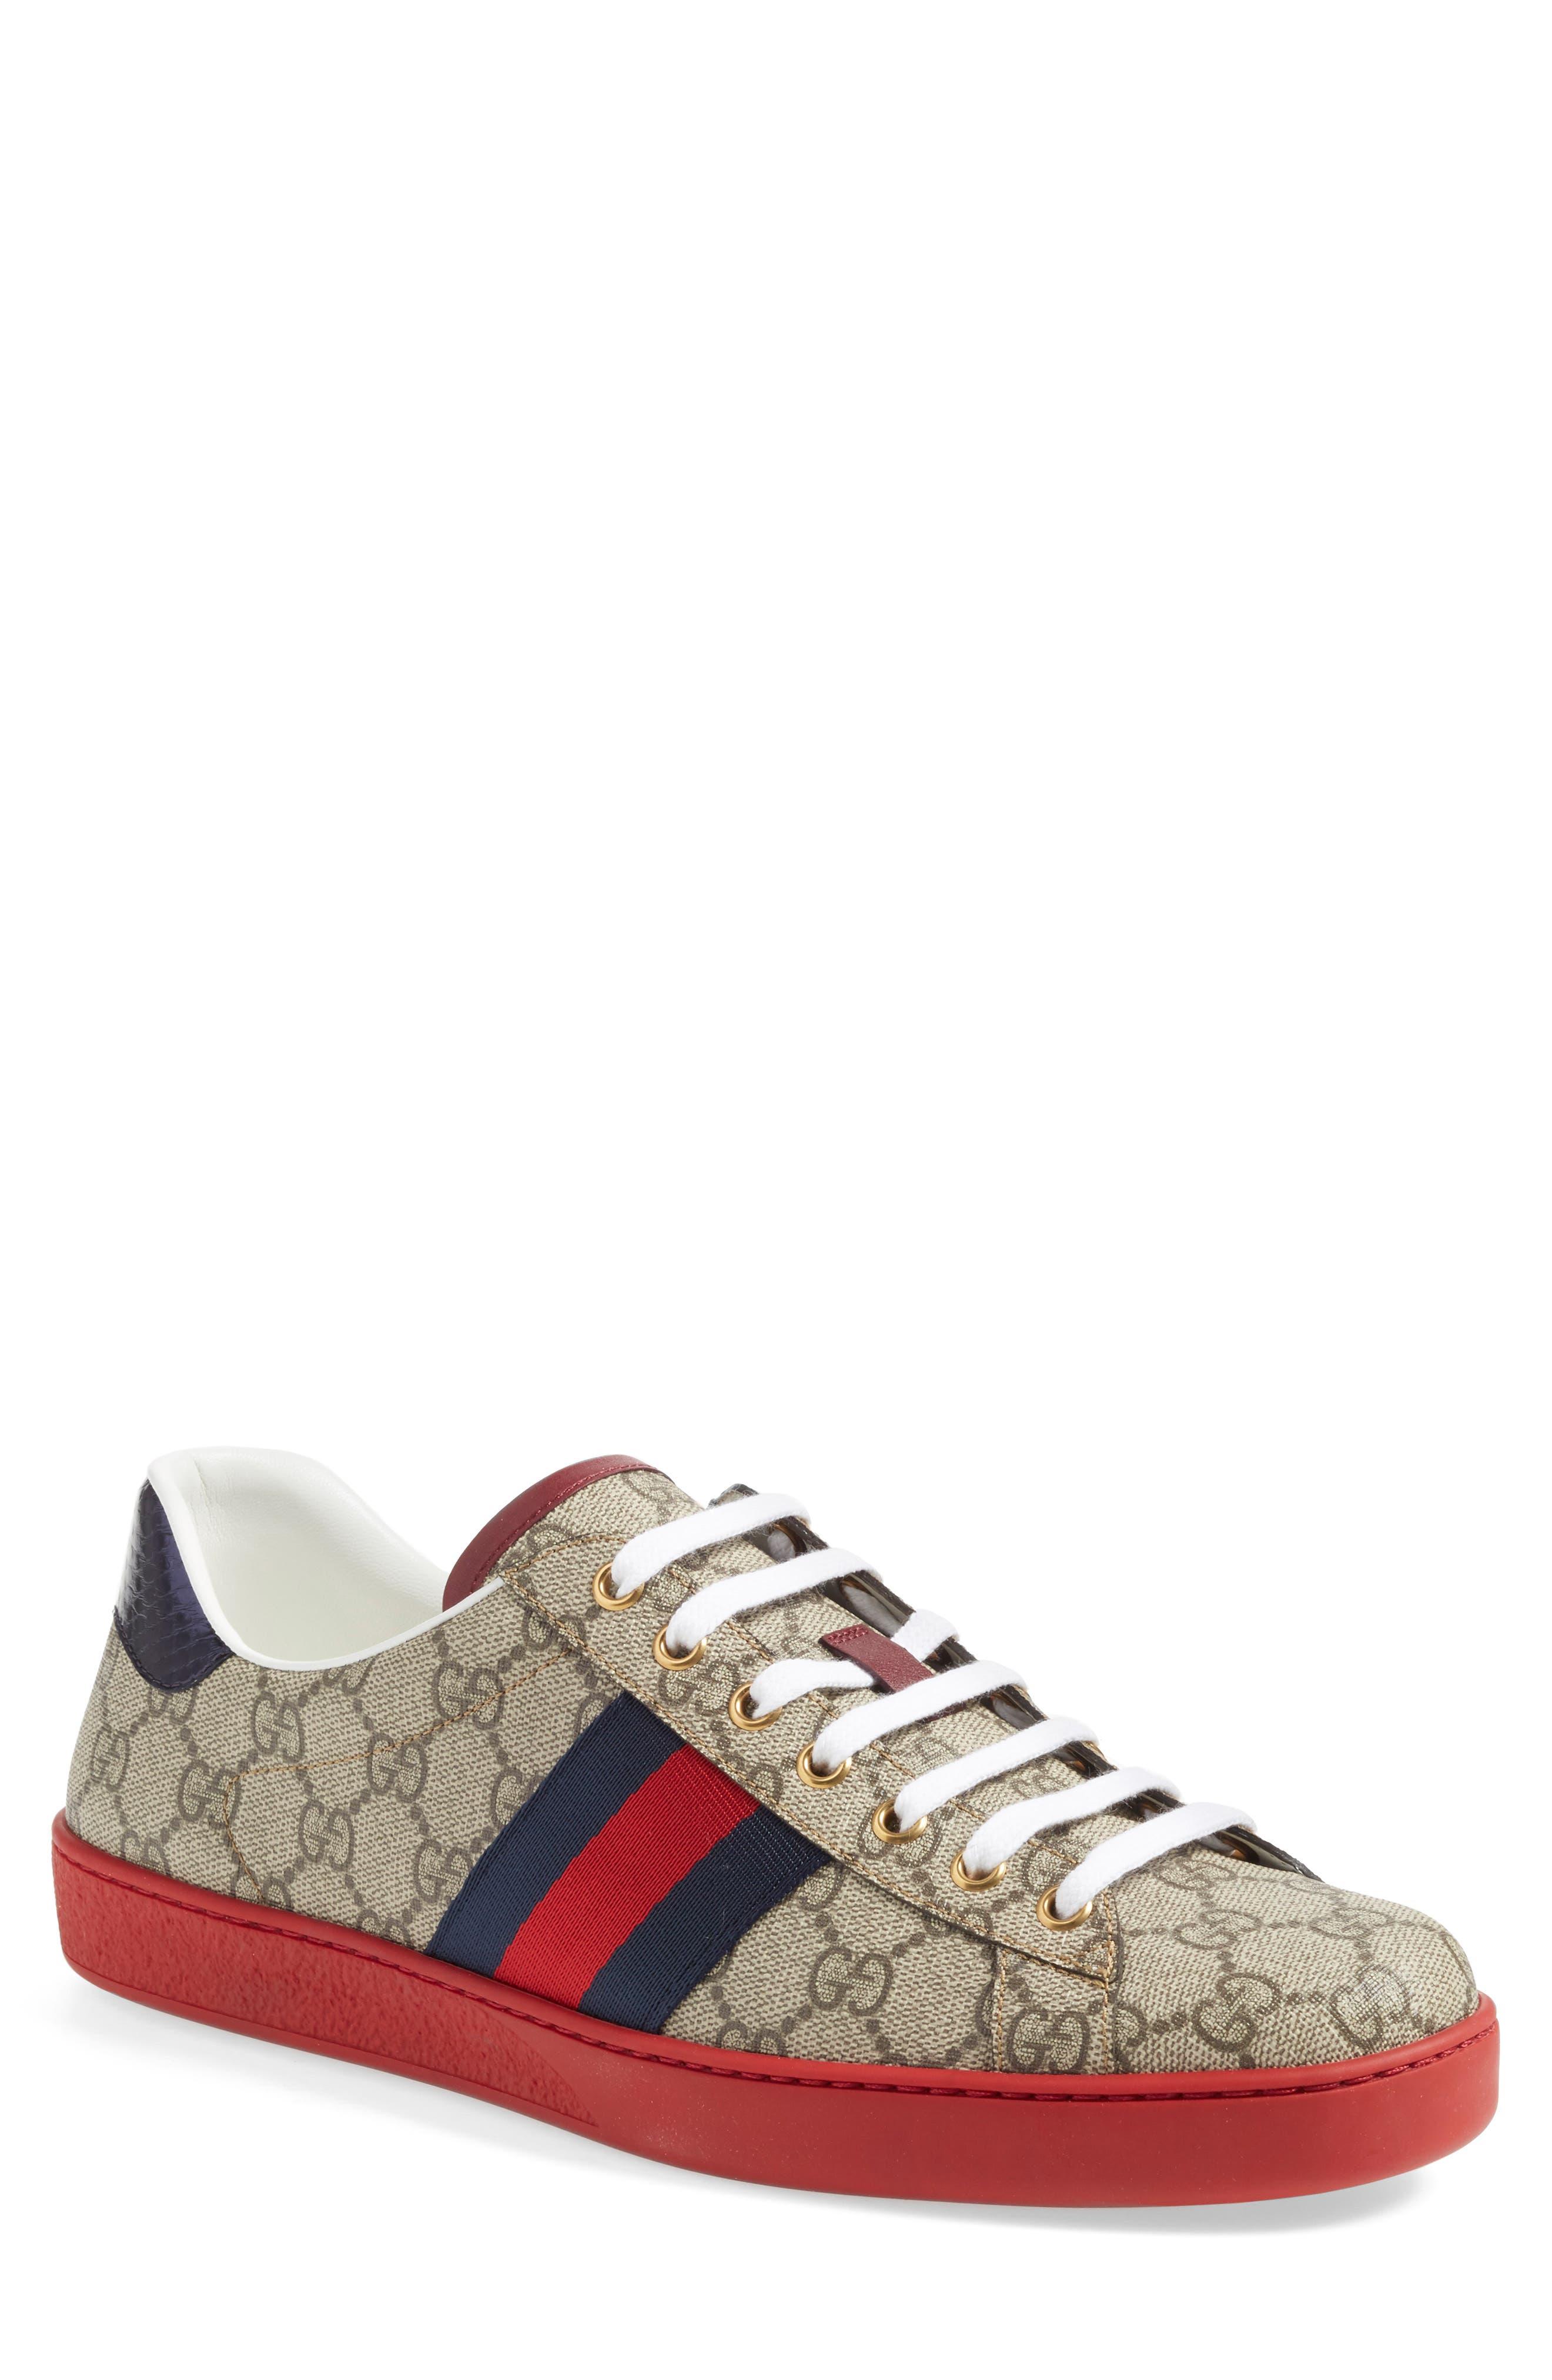 Www.gucci shoes for men.com